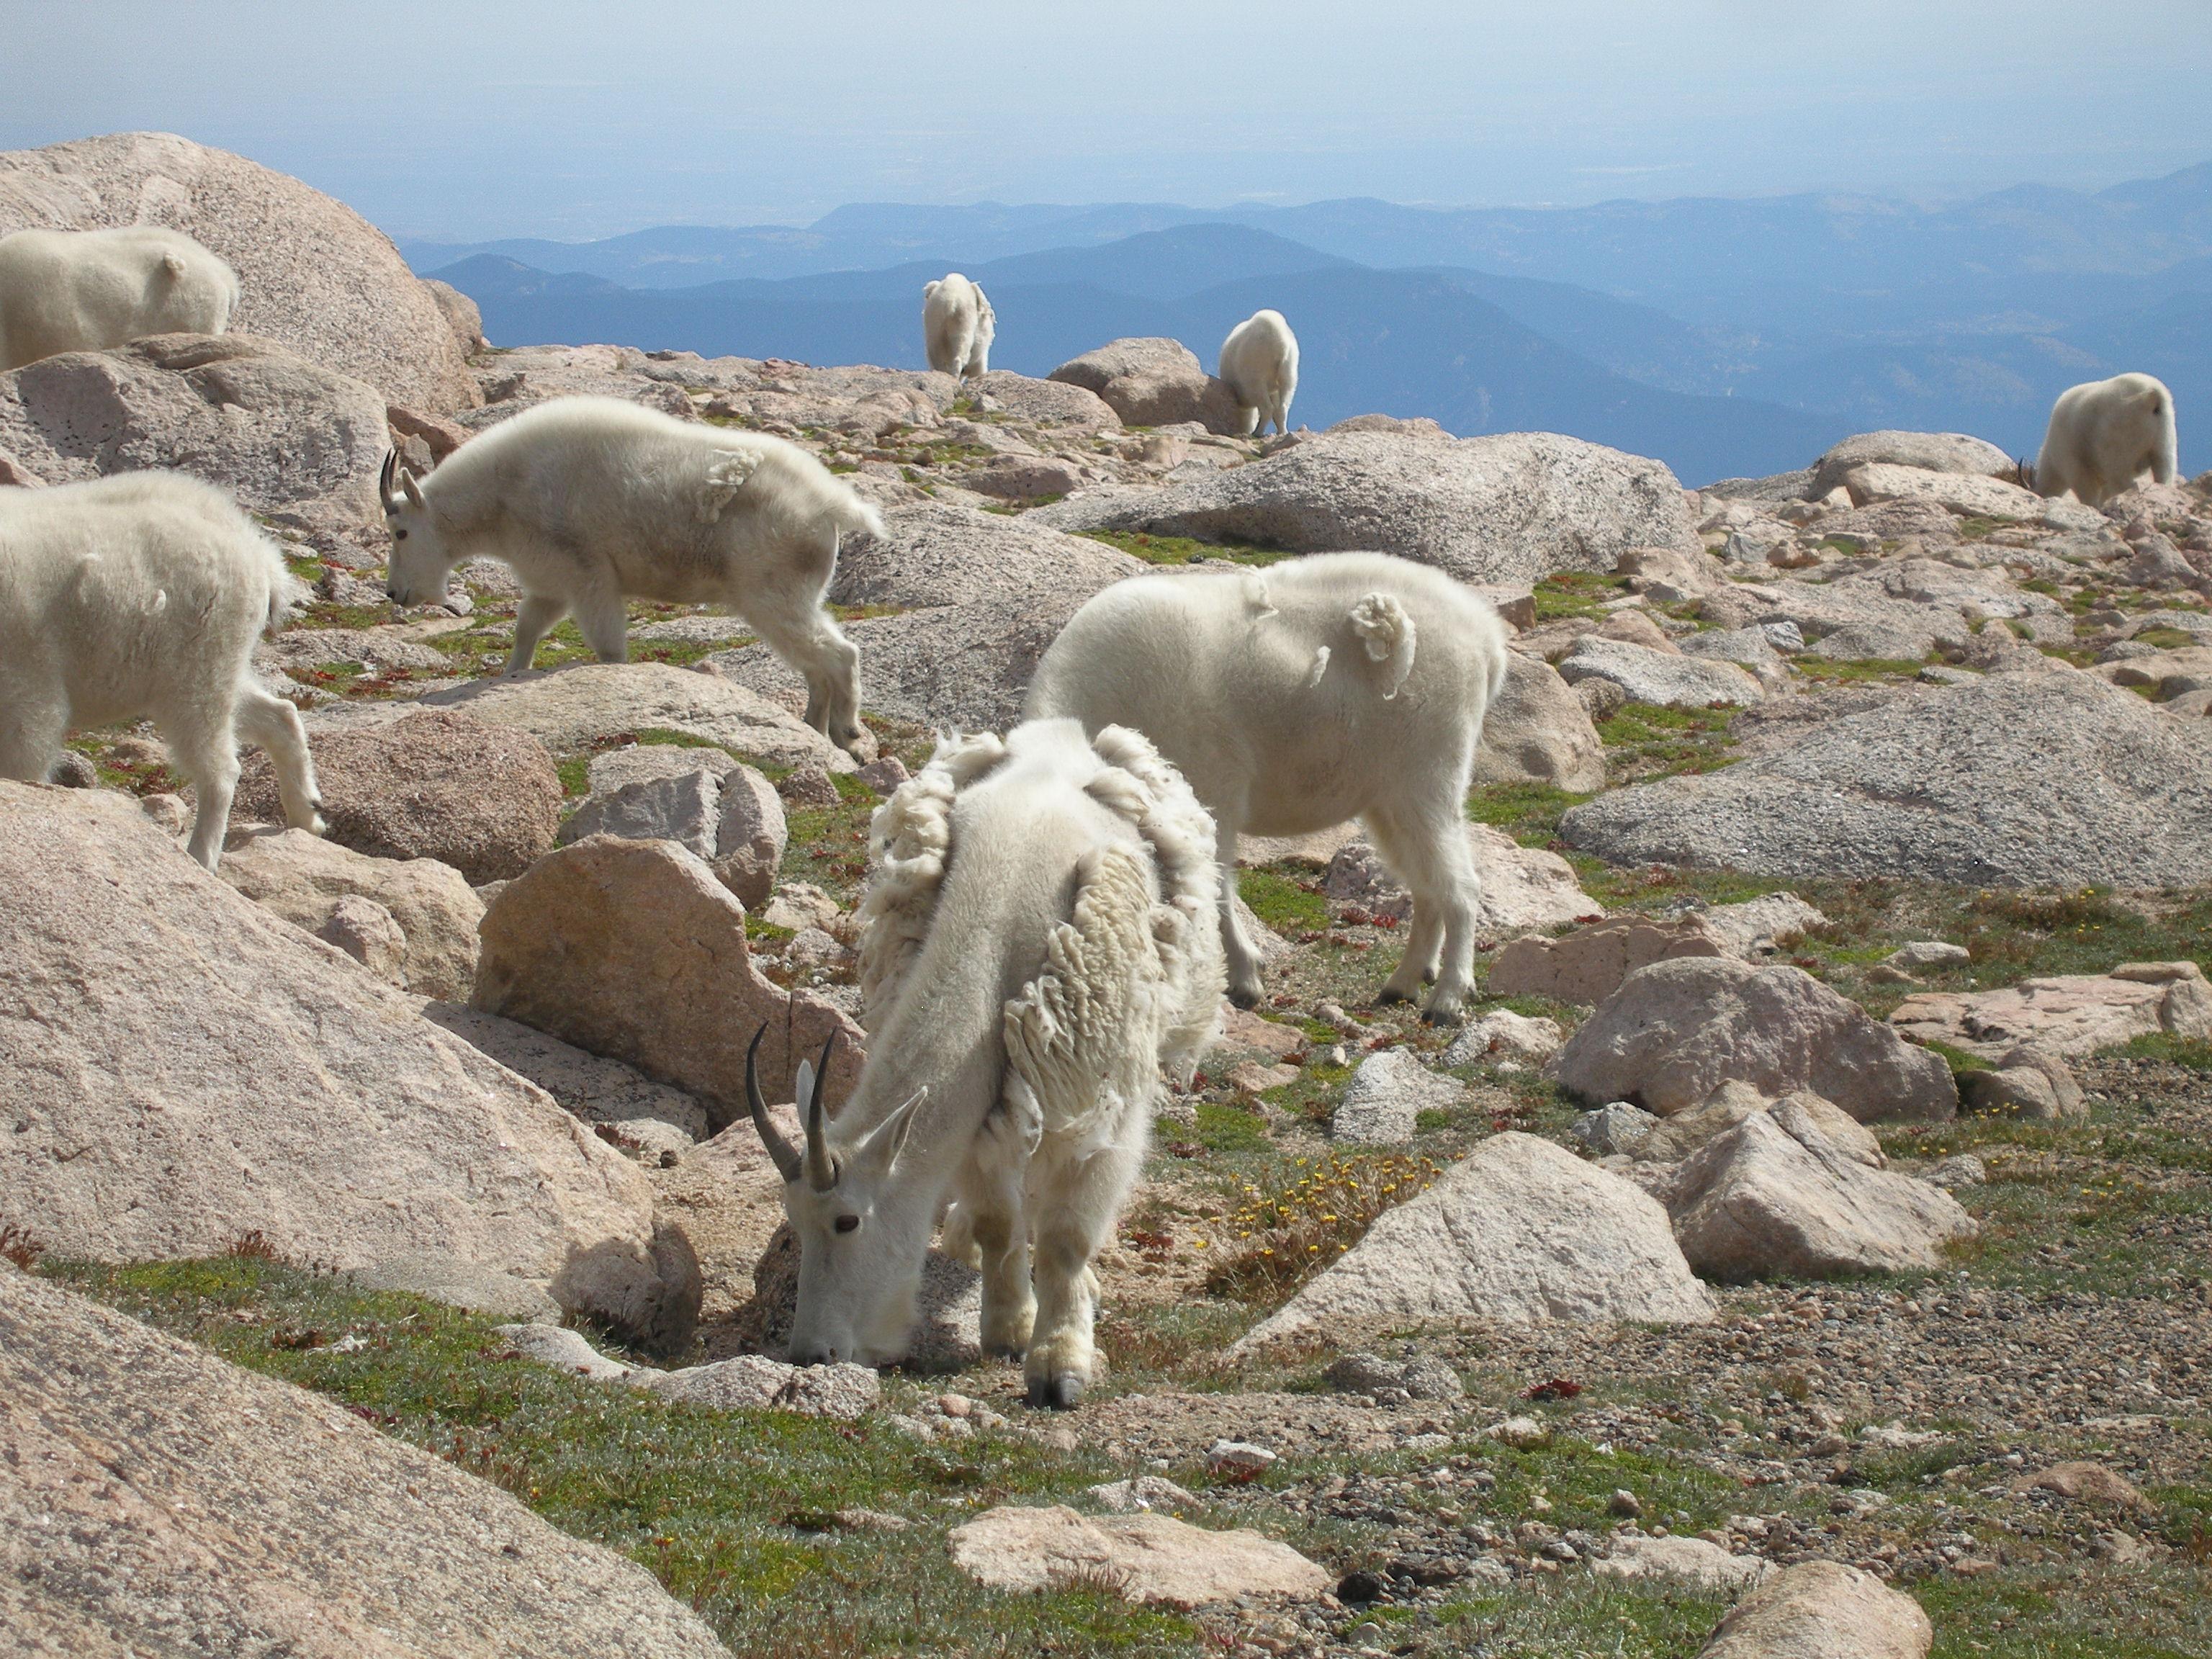 Mountain Goats detail image